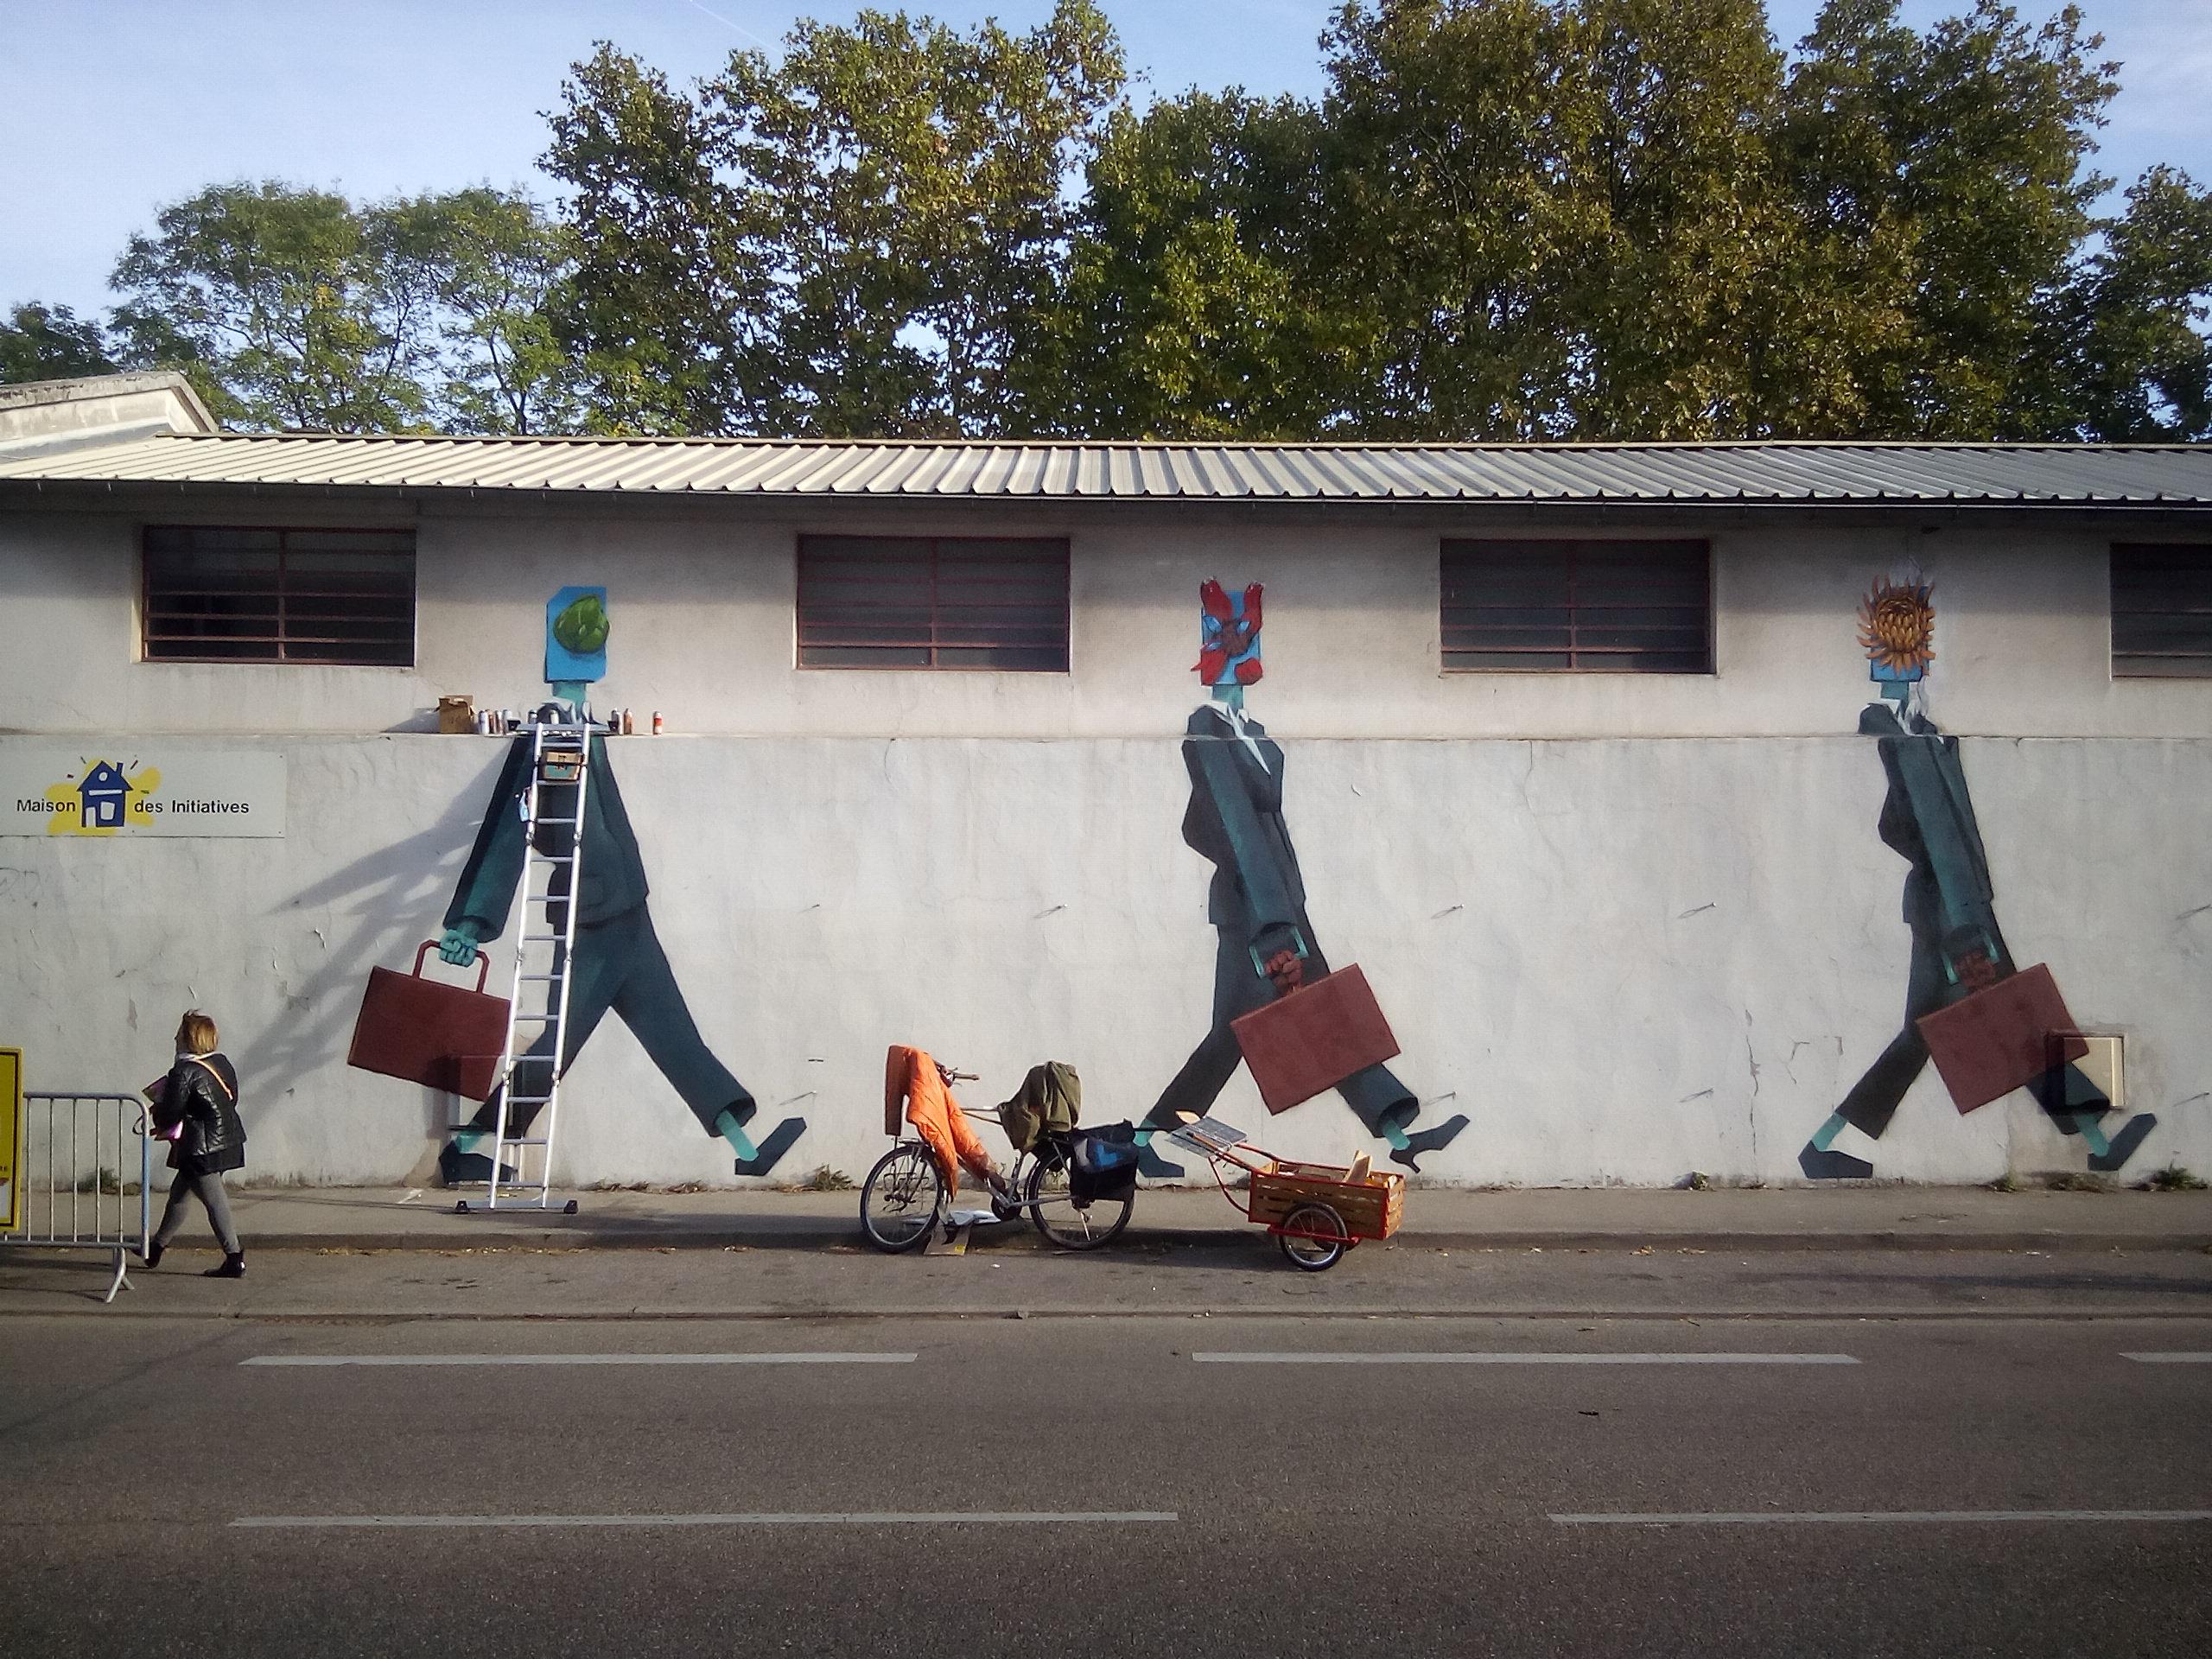 Peinture Murale symboliste, street art.